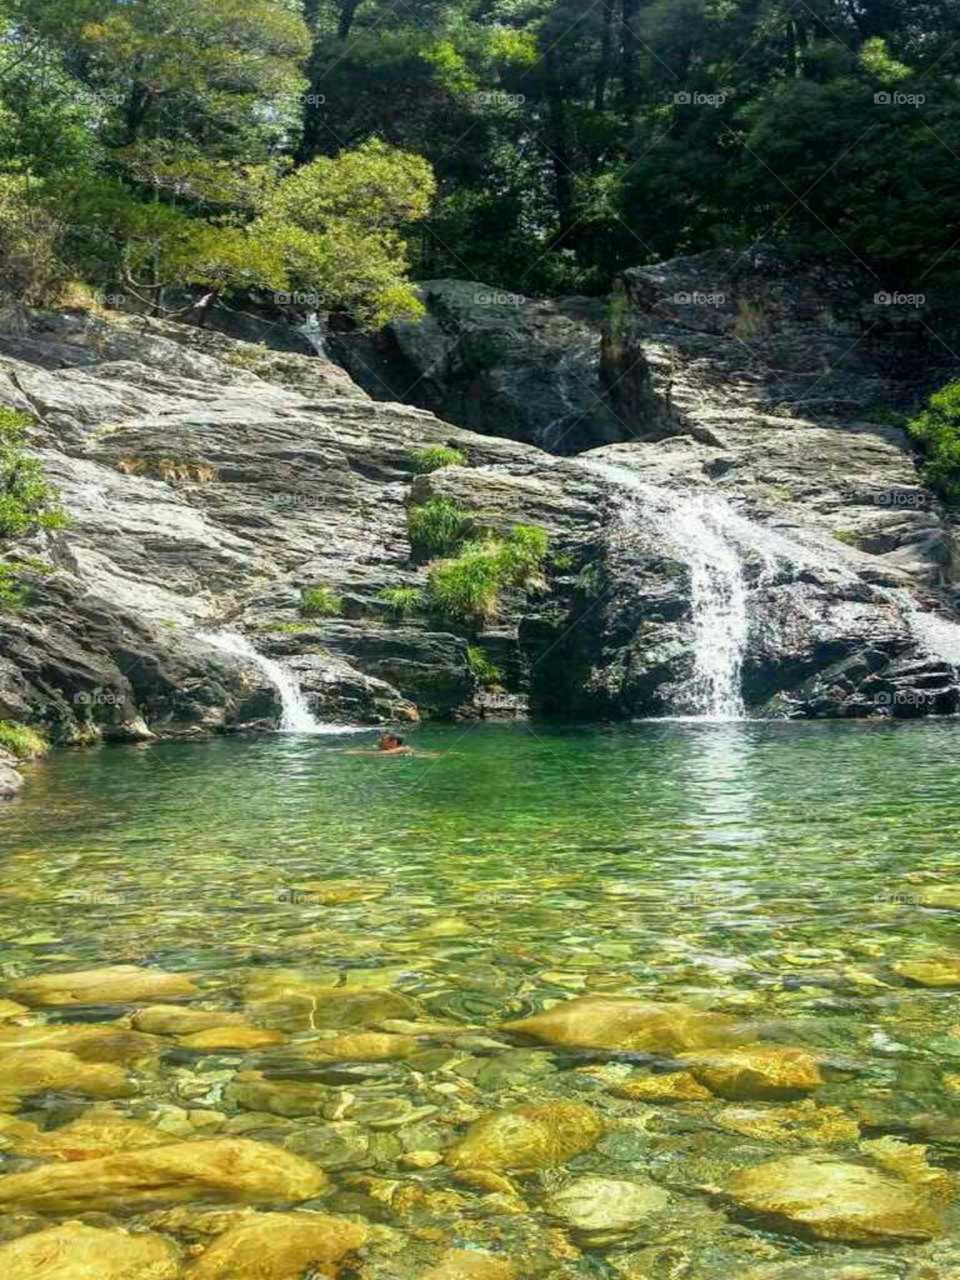 Cascata do Pincho (Pincho waterfall), Viana do Castelo, Portugal